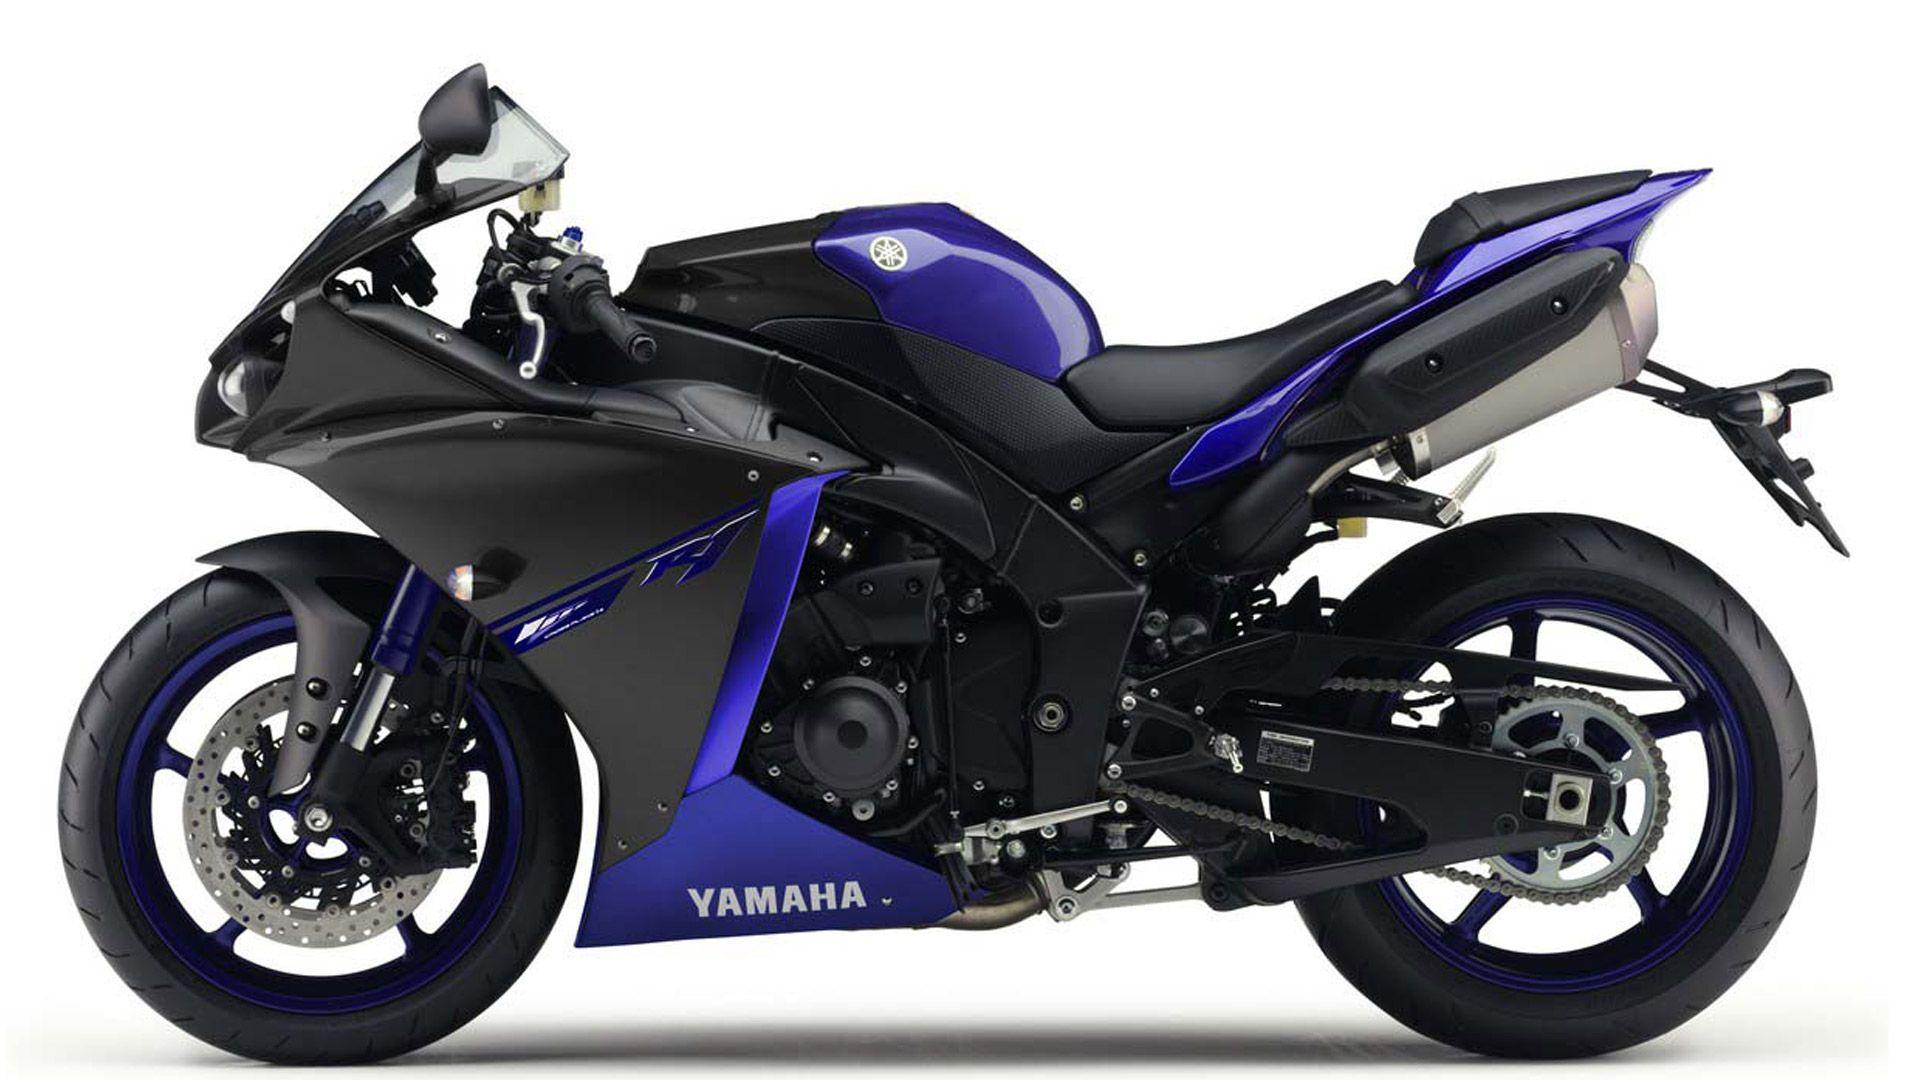 2014 Yamaha YZF R1 Race Blu Specs 2014 Yamaha YZF R1 Race Blu Design ...